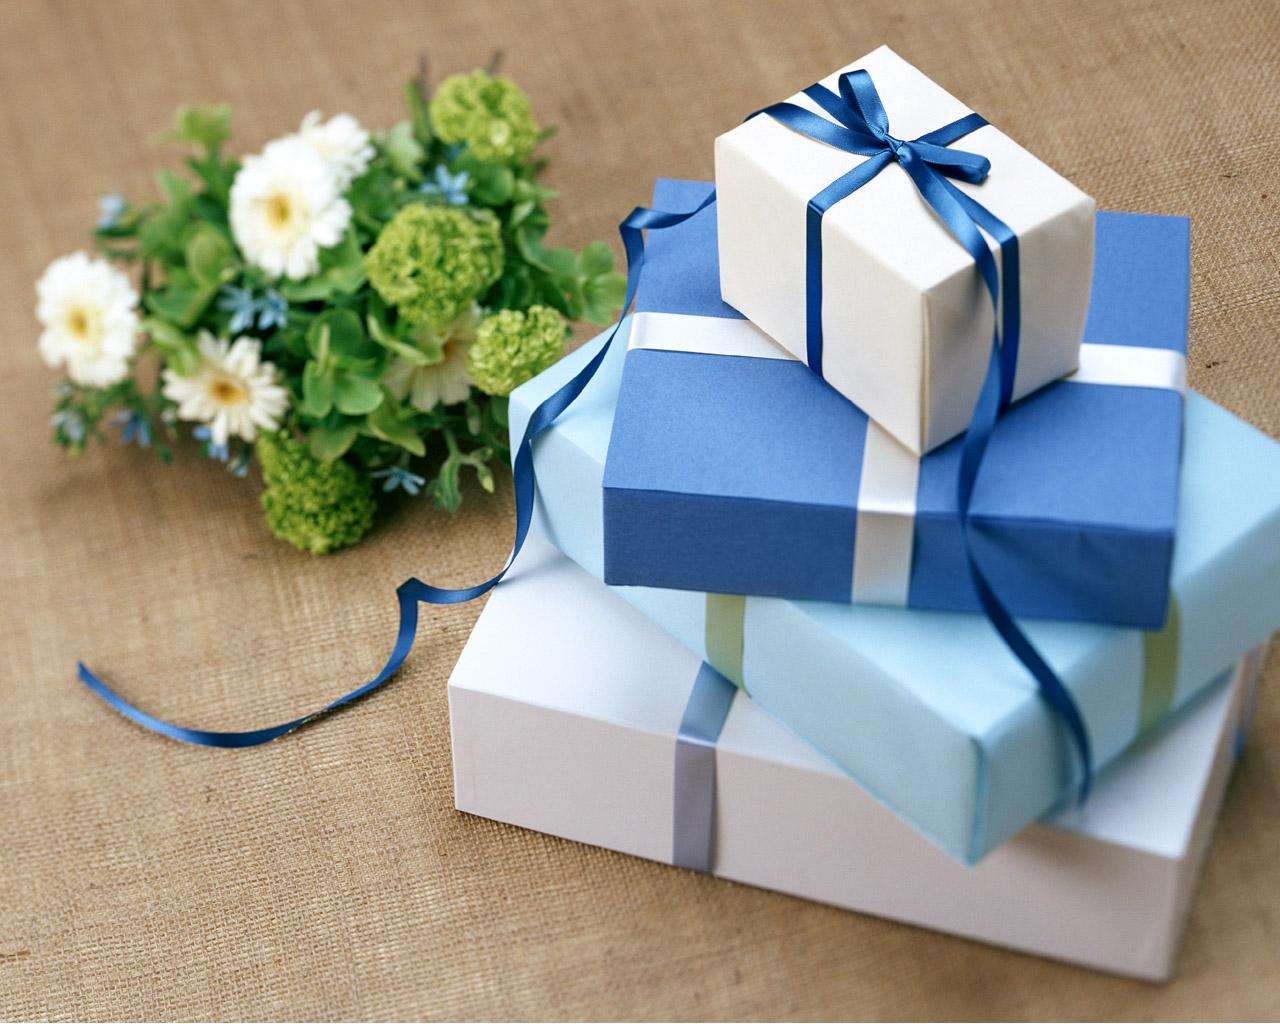 http://2.bp.blogspot.com/-7pvk--LPE84/TeeBPk0WwQI/AAAAAAAAA94/MWLrm0v8zoQ/s1600/buy_of_gifts+wallpaper.jpg